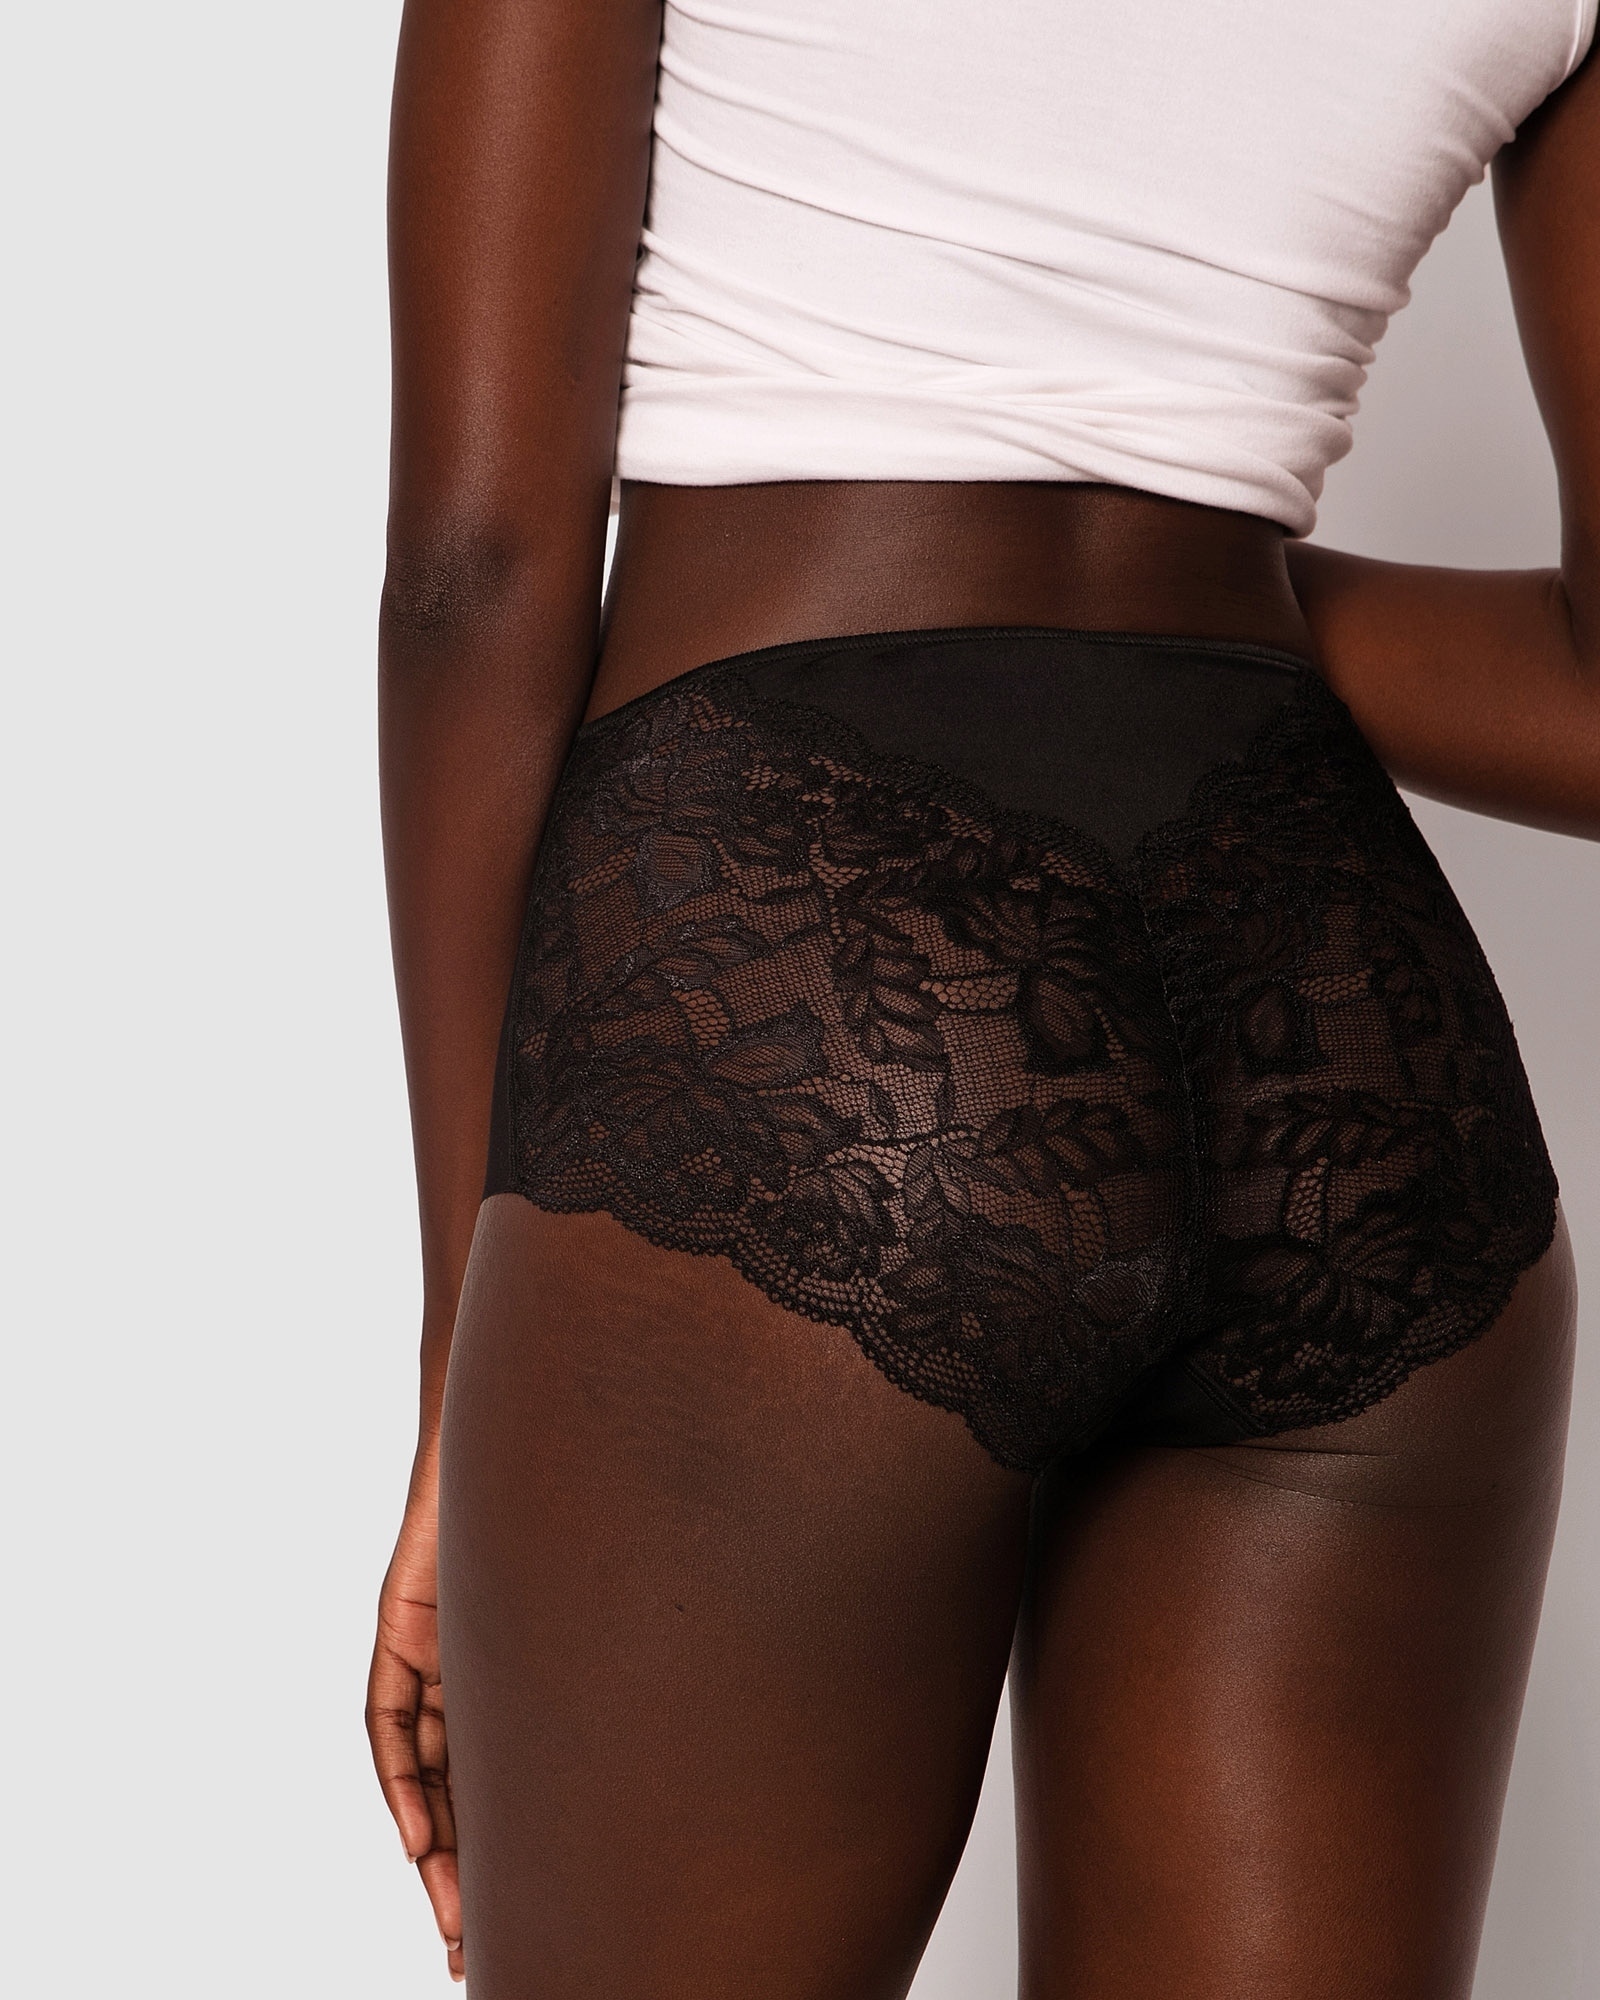 Smooth Comfort Lace Midi Brief Knicker - Black